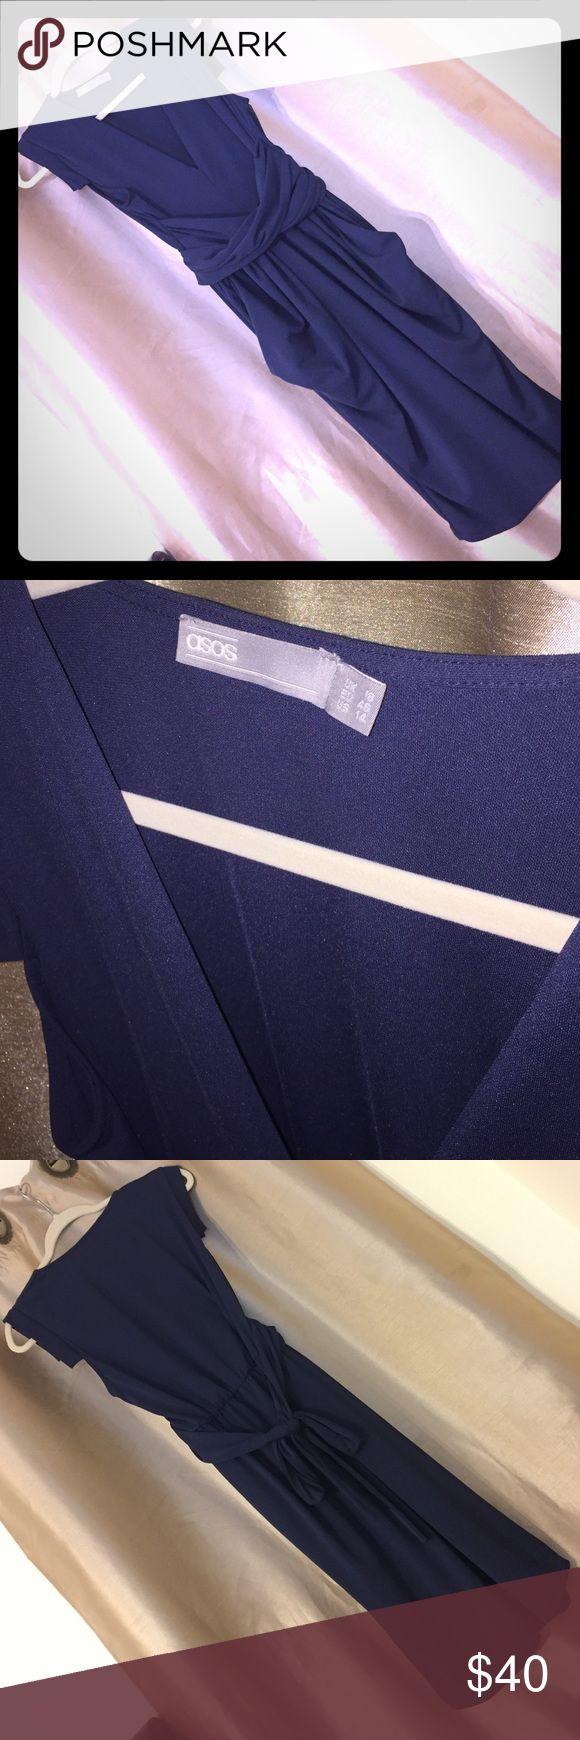 ASOS Curve Dress Obi Wrap ASOS Curve navy blue crepe dress with Obi Wrap. Size 14 has pockets! ASOS Curve Dresses